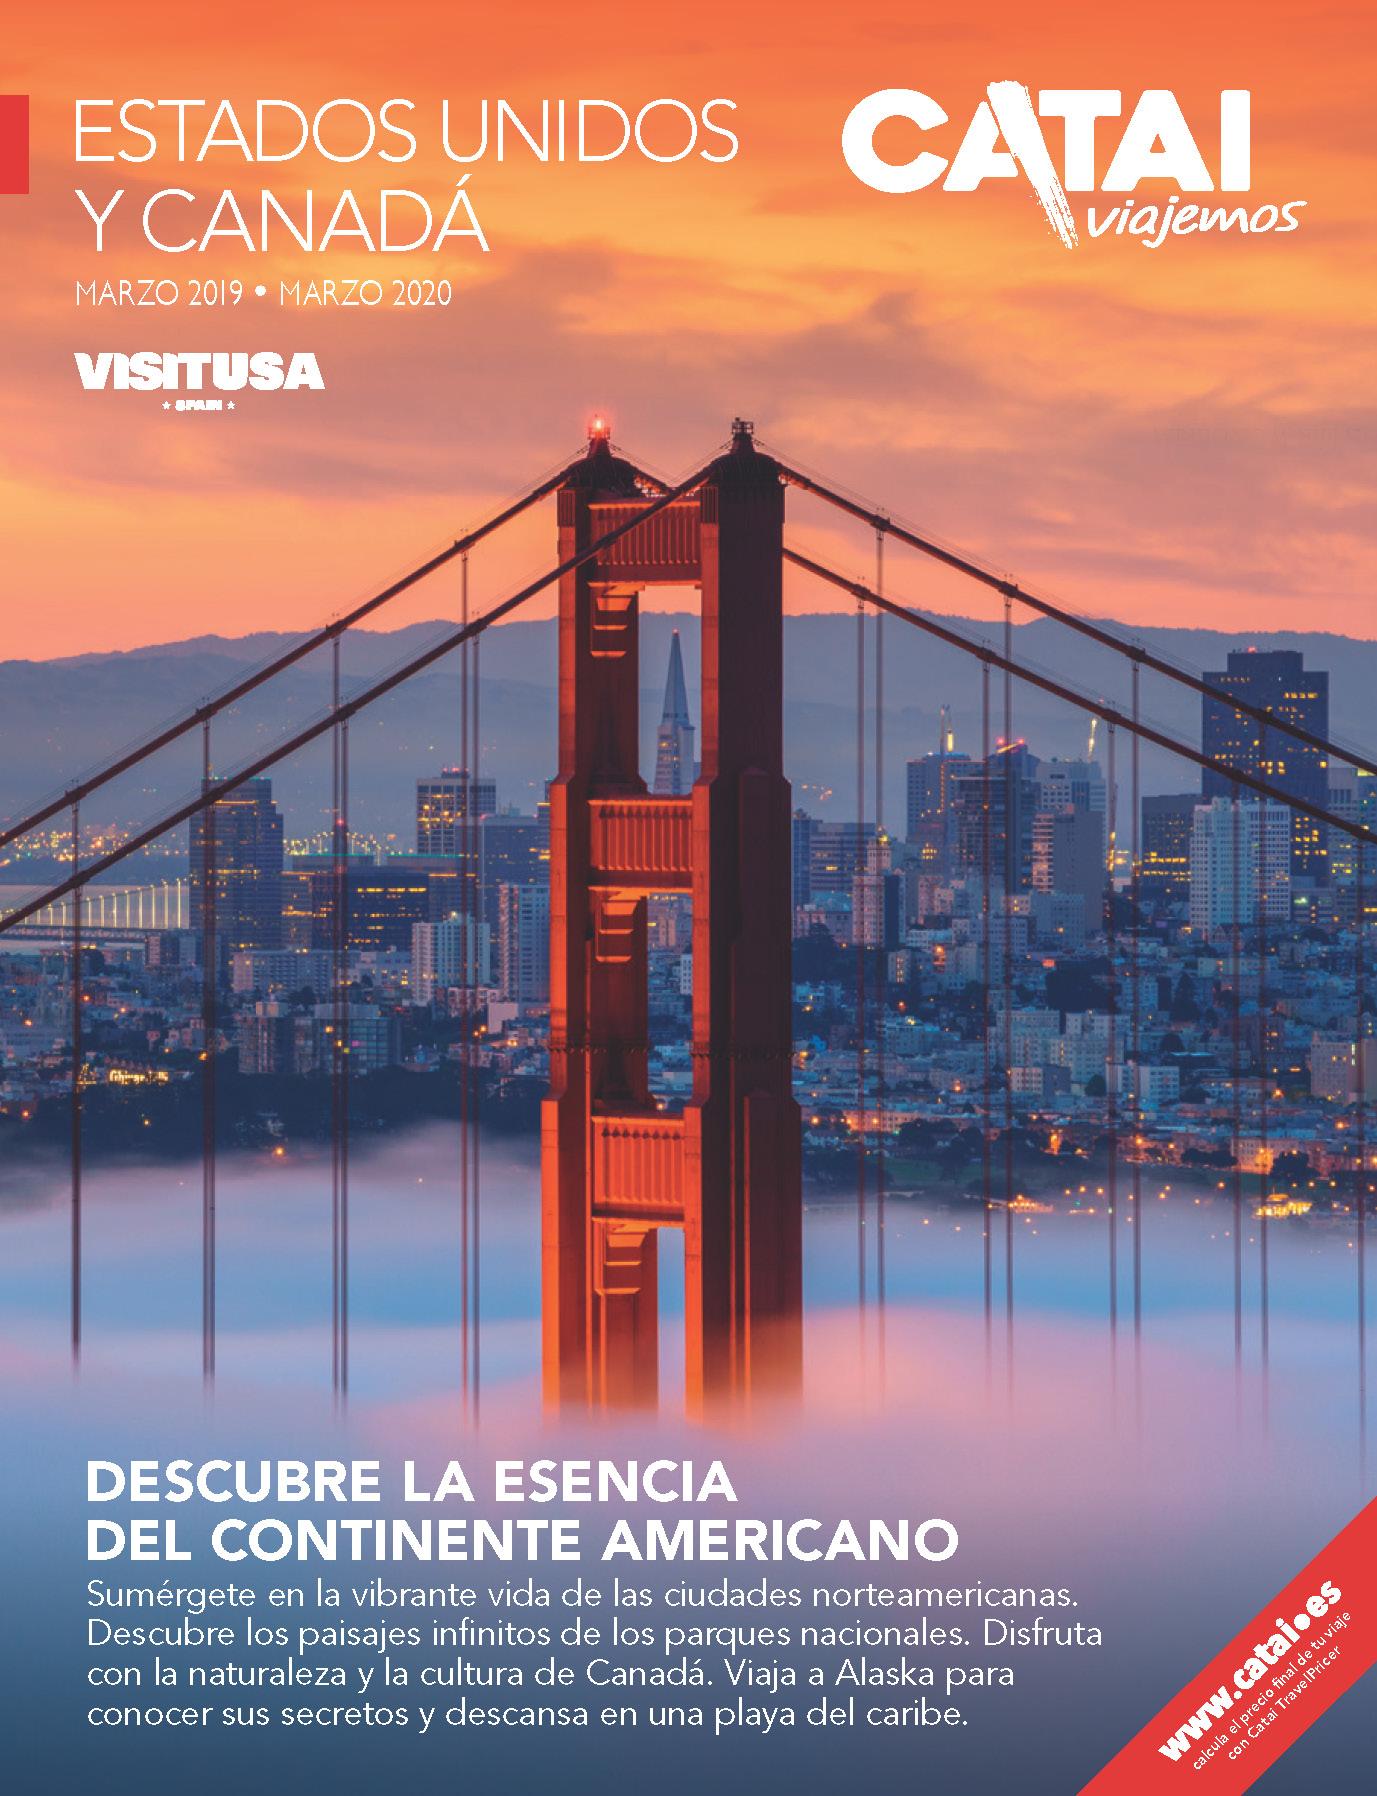 Catalogo Catai USA y Canada 2019-2020